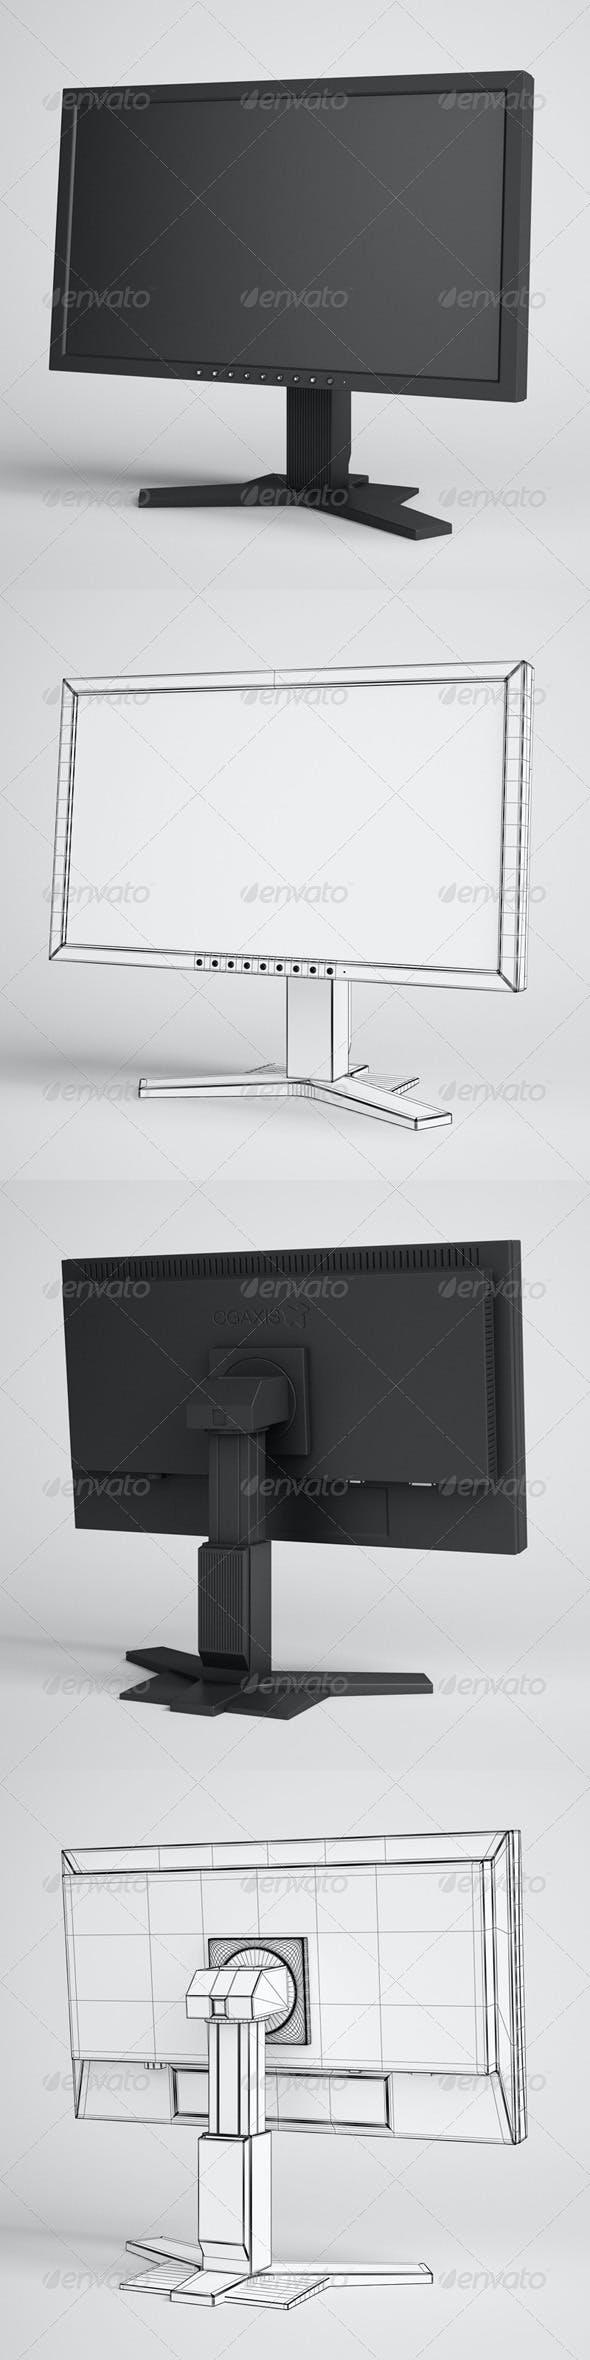 CGAxis Flatscreen Monitor Electronics 20 - 3DOcean Item for Sale